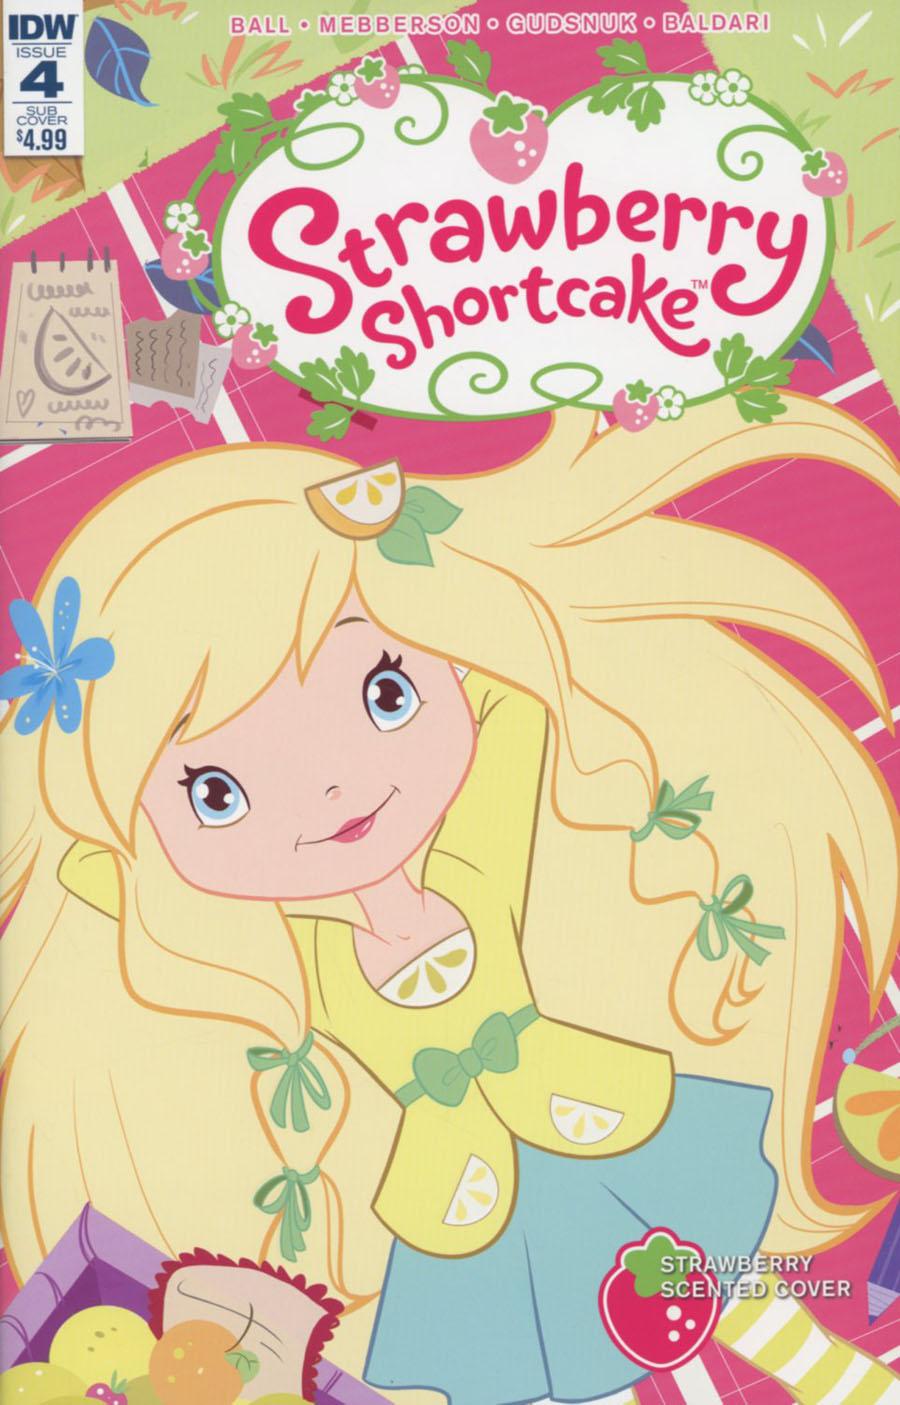 Strawberry Shortcake Vol 3 #4 Cover C Variant Nicoletta Baldari Scented Cover